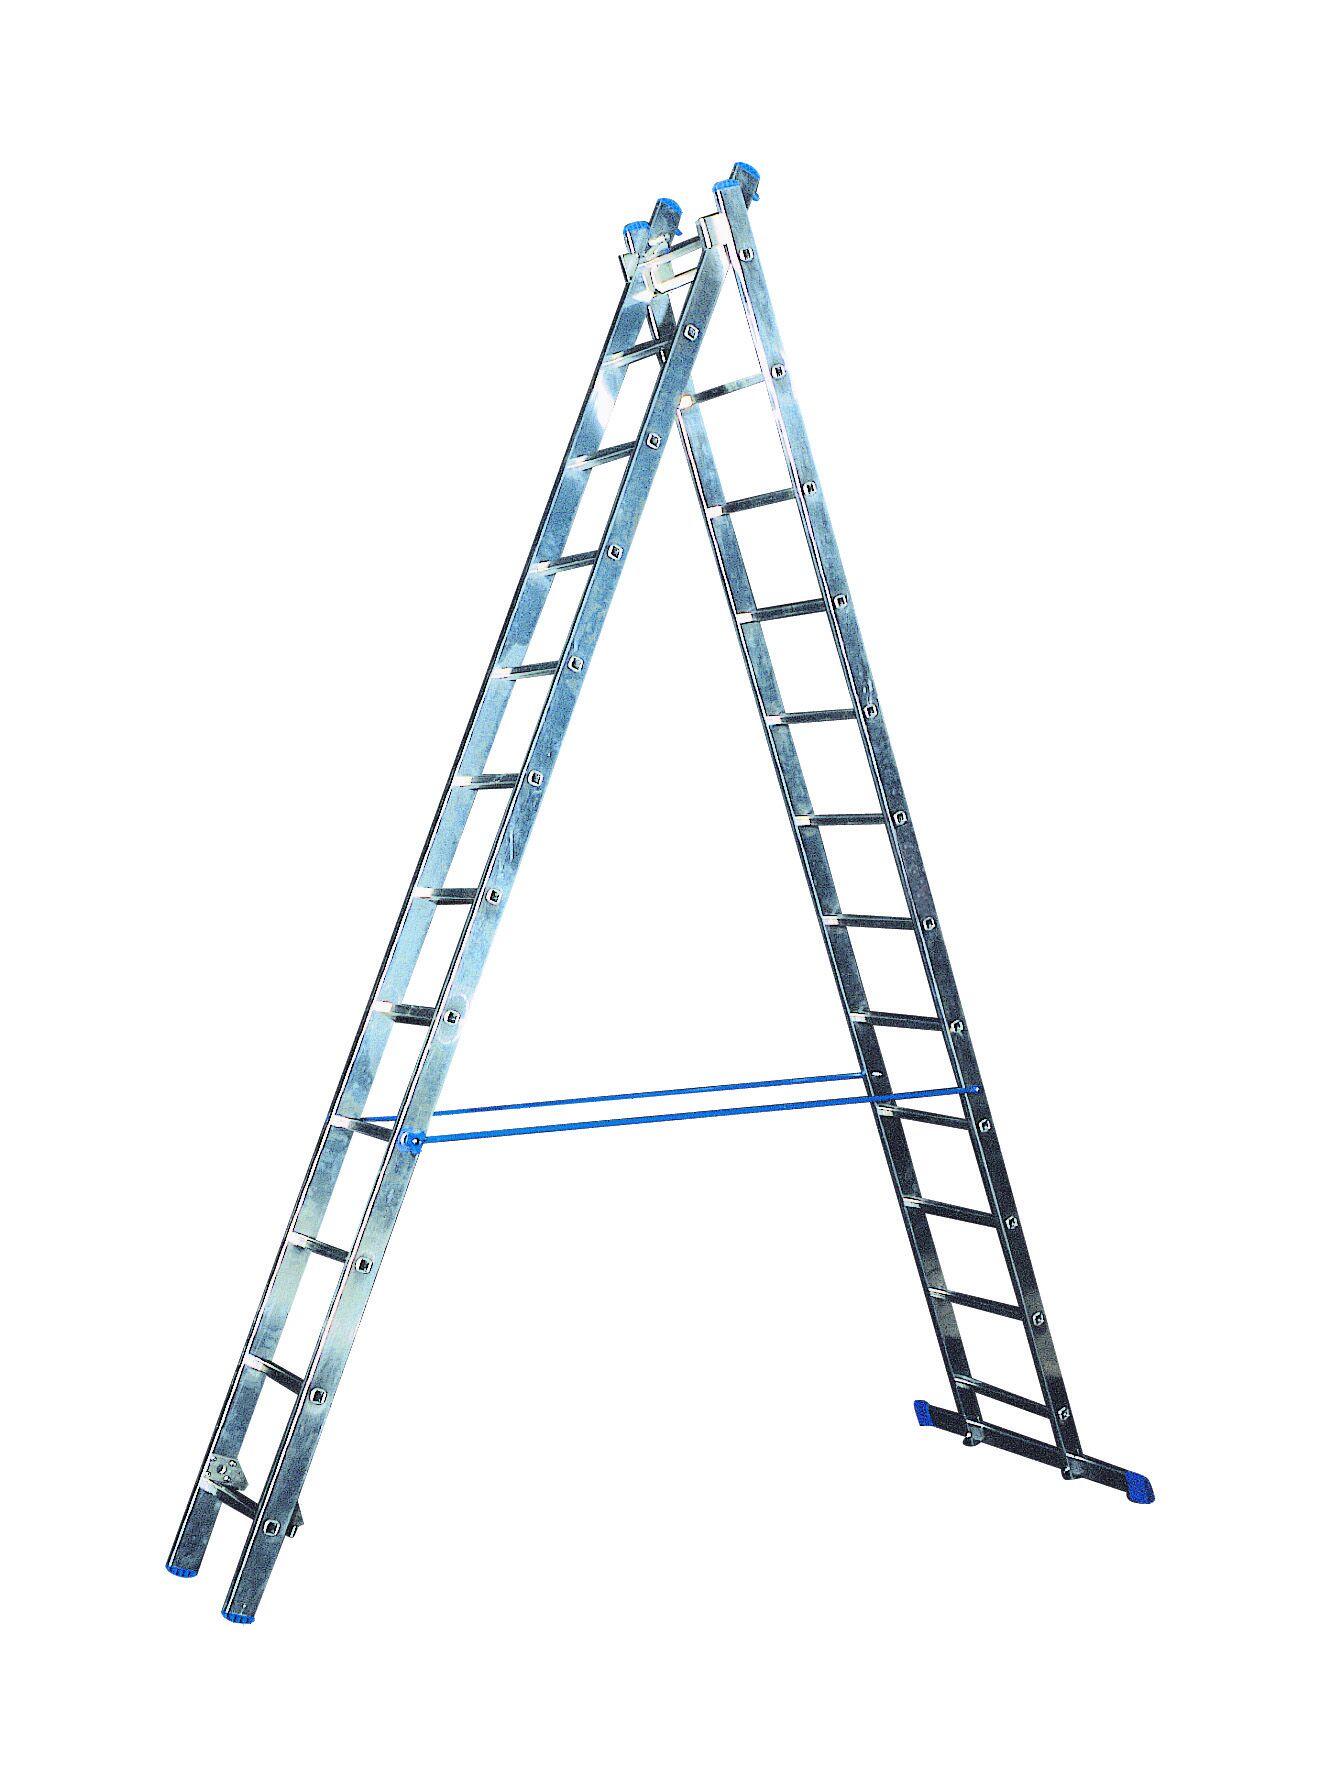 Žebřík hliníkový víceučelový HOBBY VHR H 2x10 Al